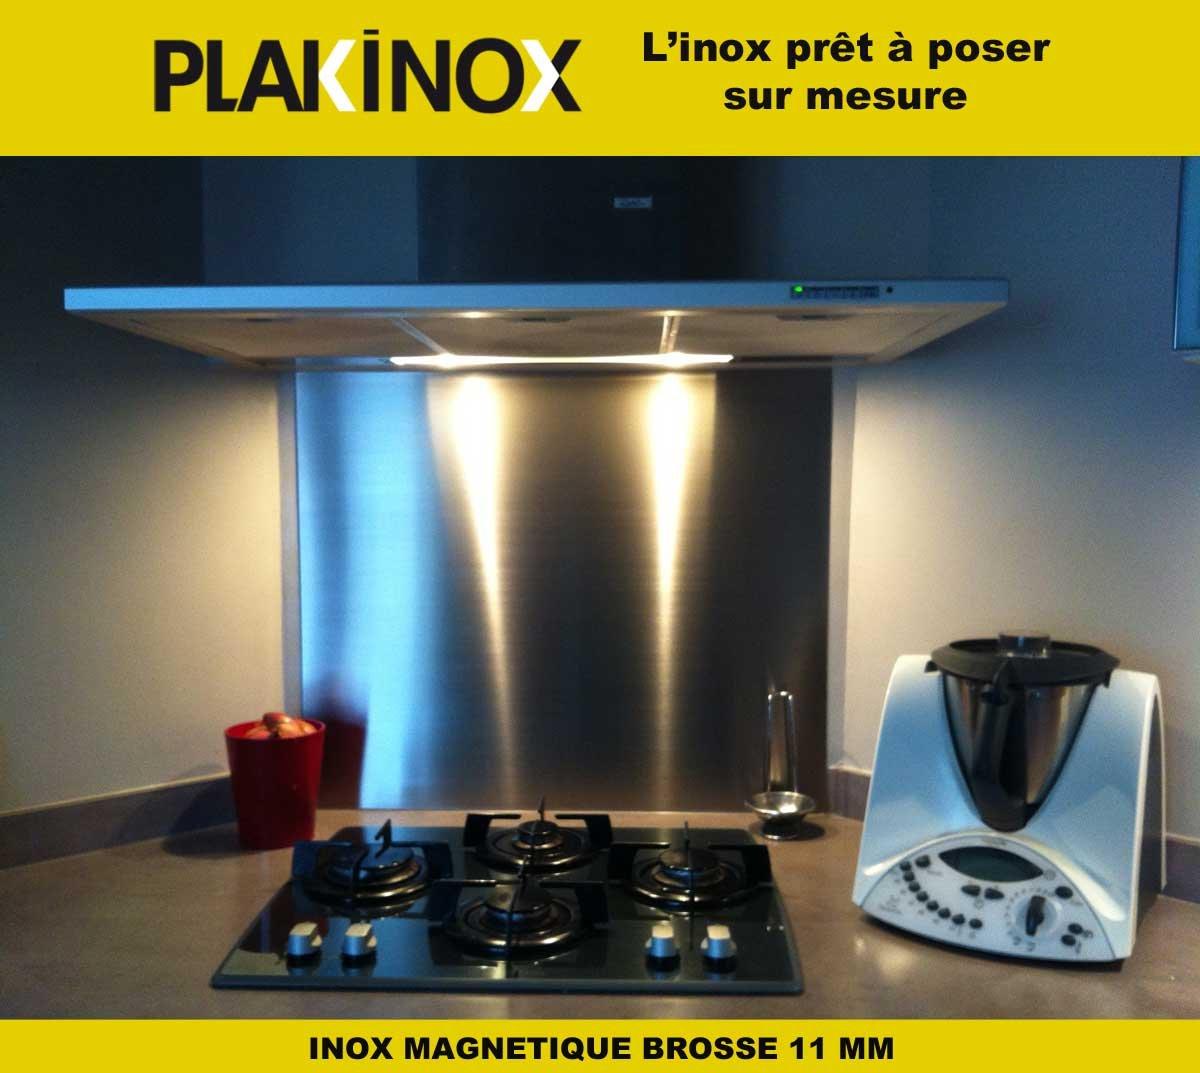 CREDENCE EN INOX MAGNETIQUE /épaisseur 11 mm Inox Bross/é 80 x 40 cm PLAKINOX